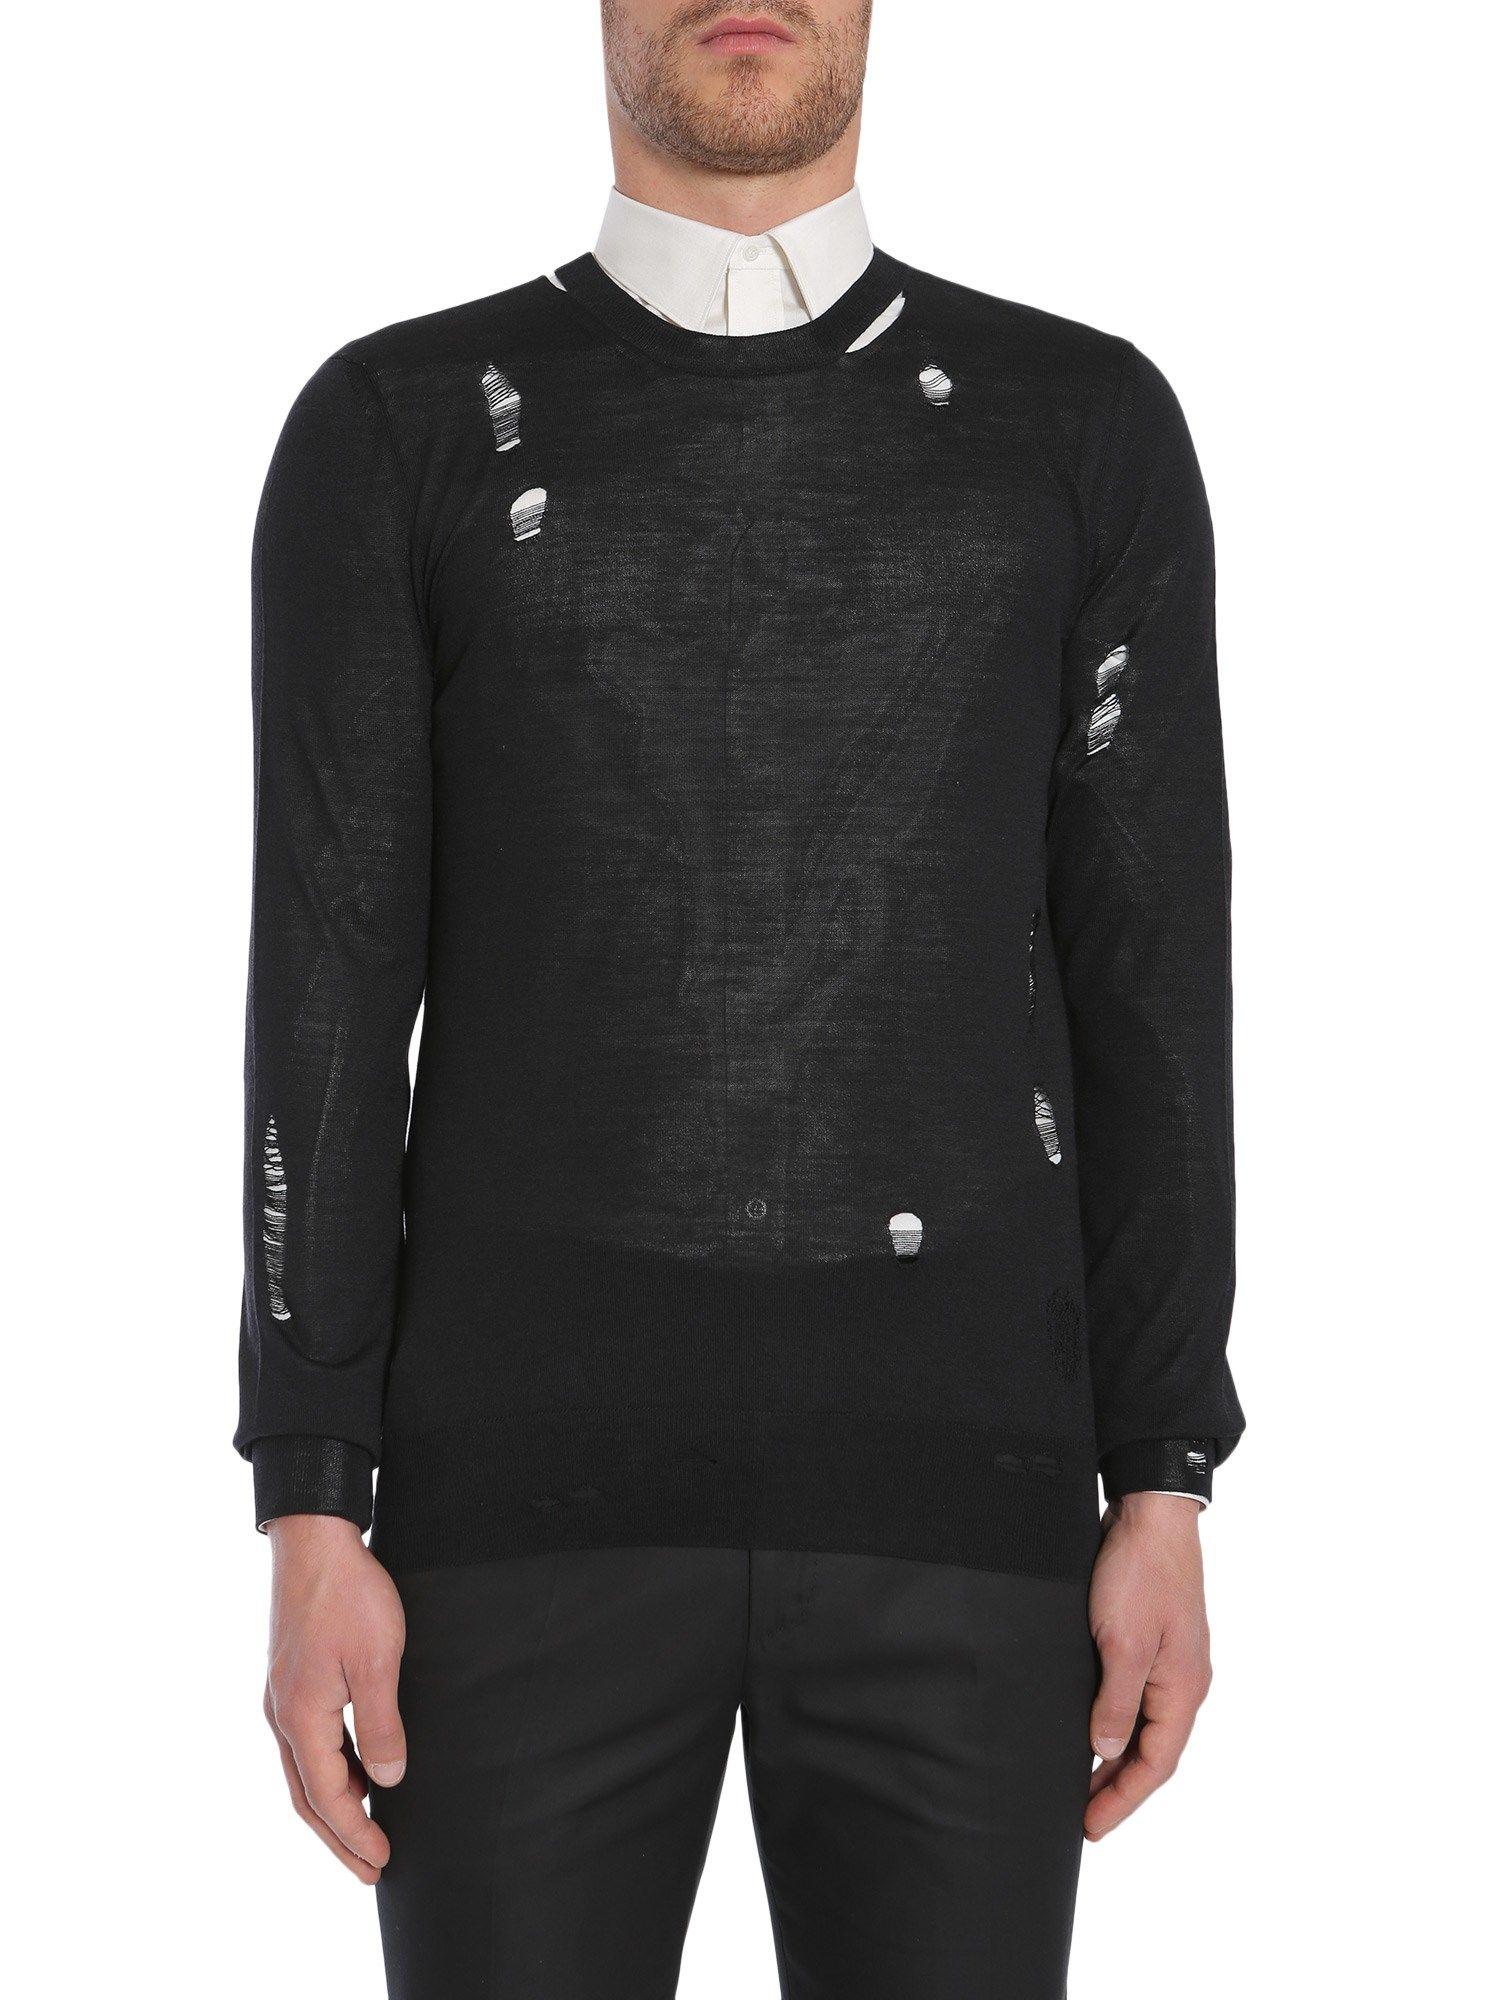 Round Collar Sweater